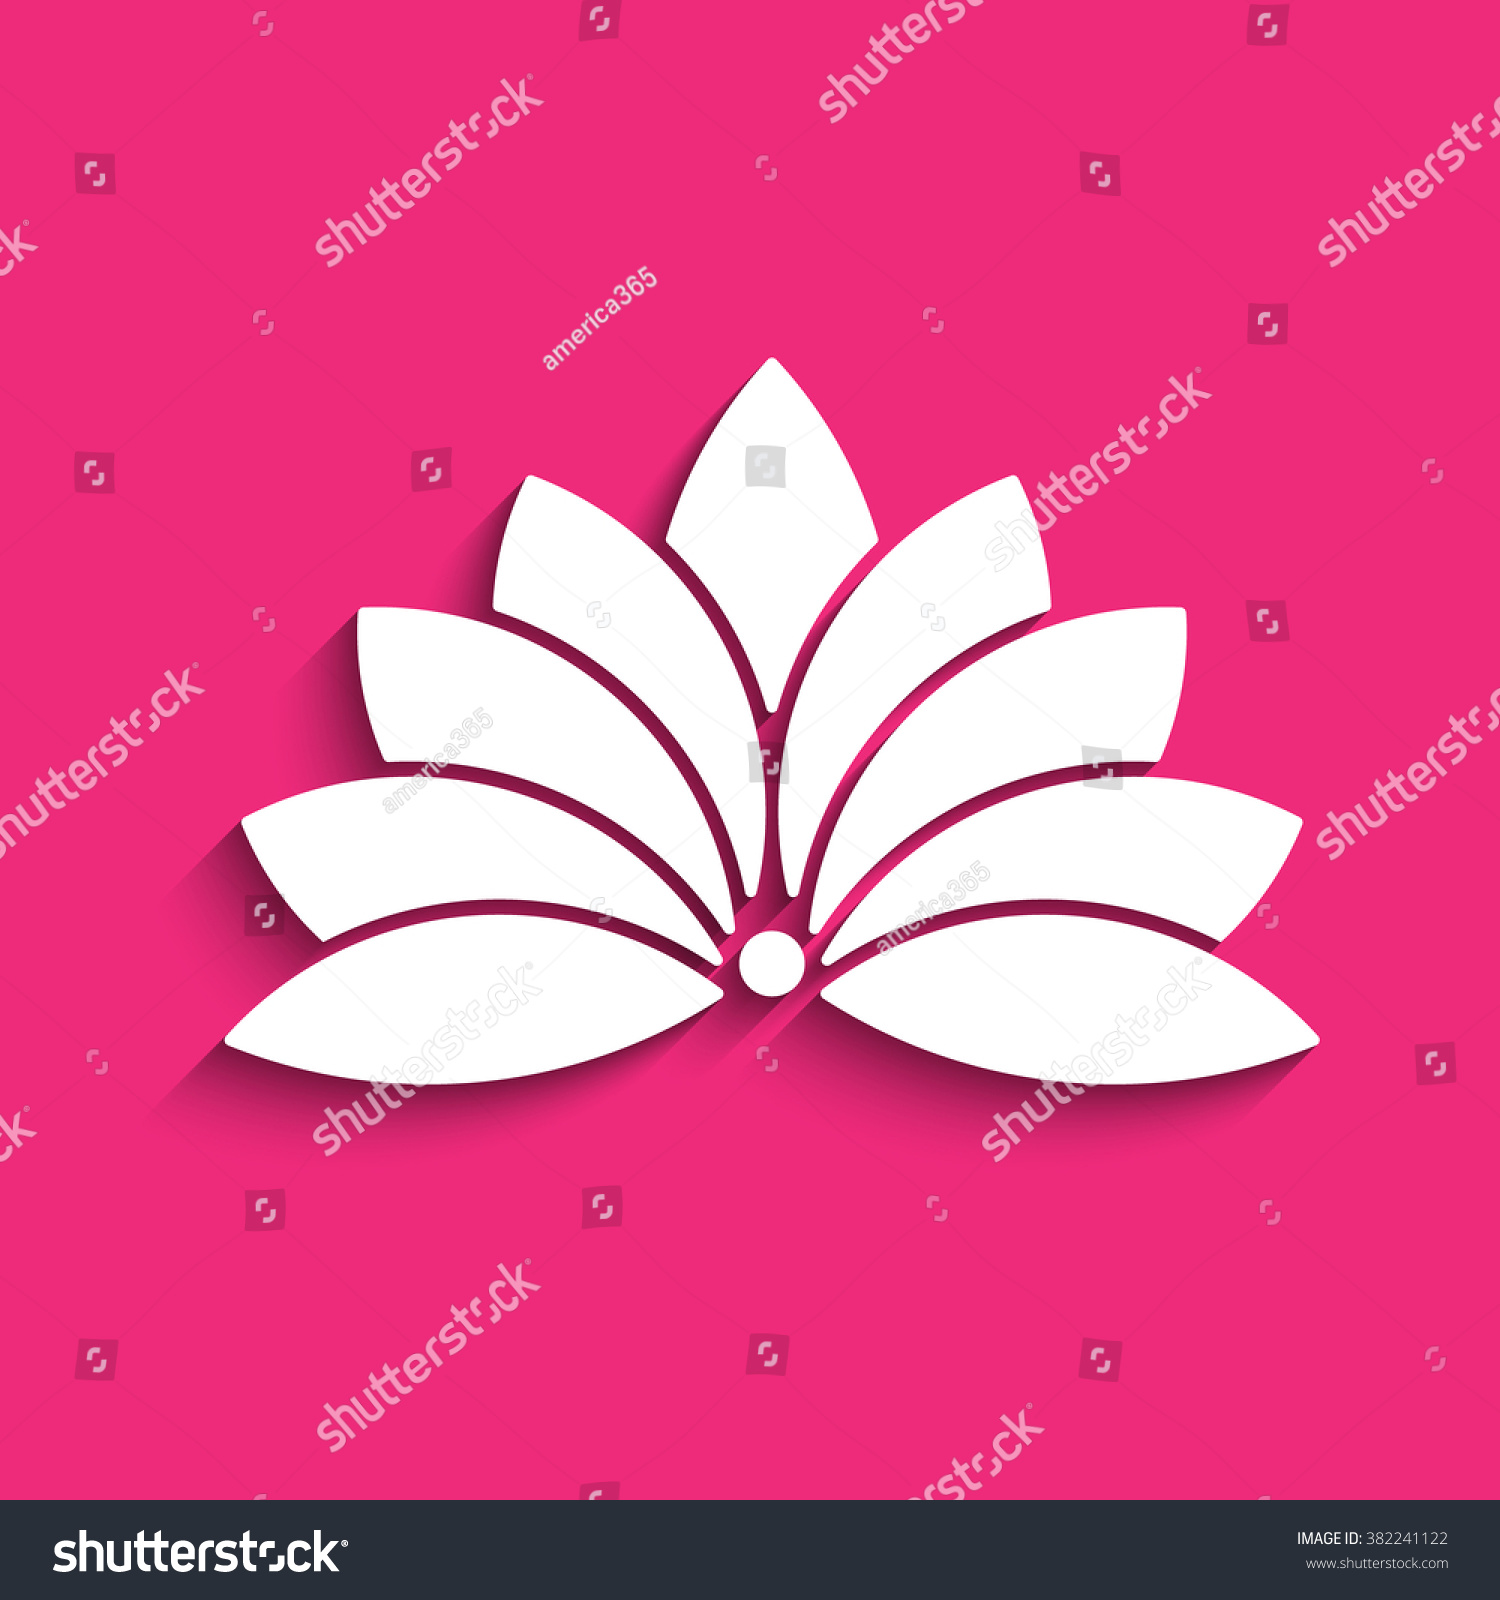 Lotus flower logo concept spirituality peace stock photo photo lotus flower logo concept of spirituality peace relax vector graphic design izmirmasajfo